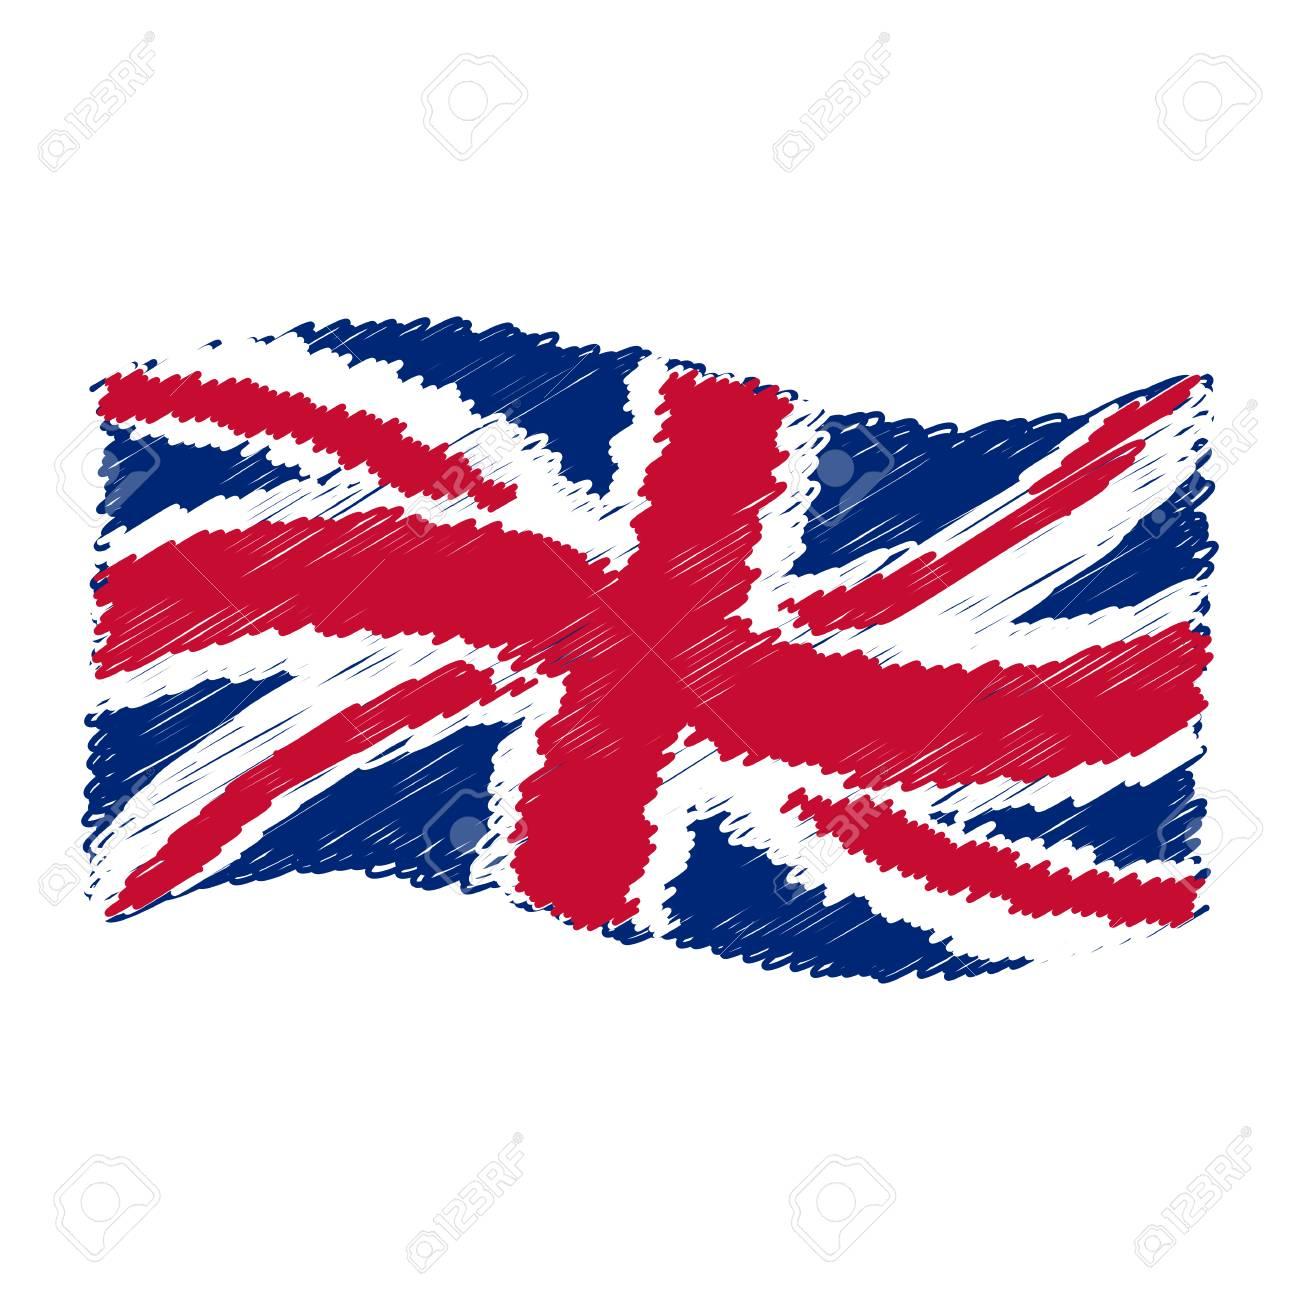 Bandera Del Reino Unido Union Jack Dibujo A Lápiz Grunge Dibujar